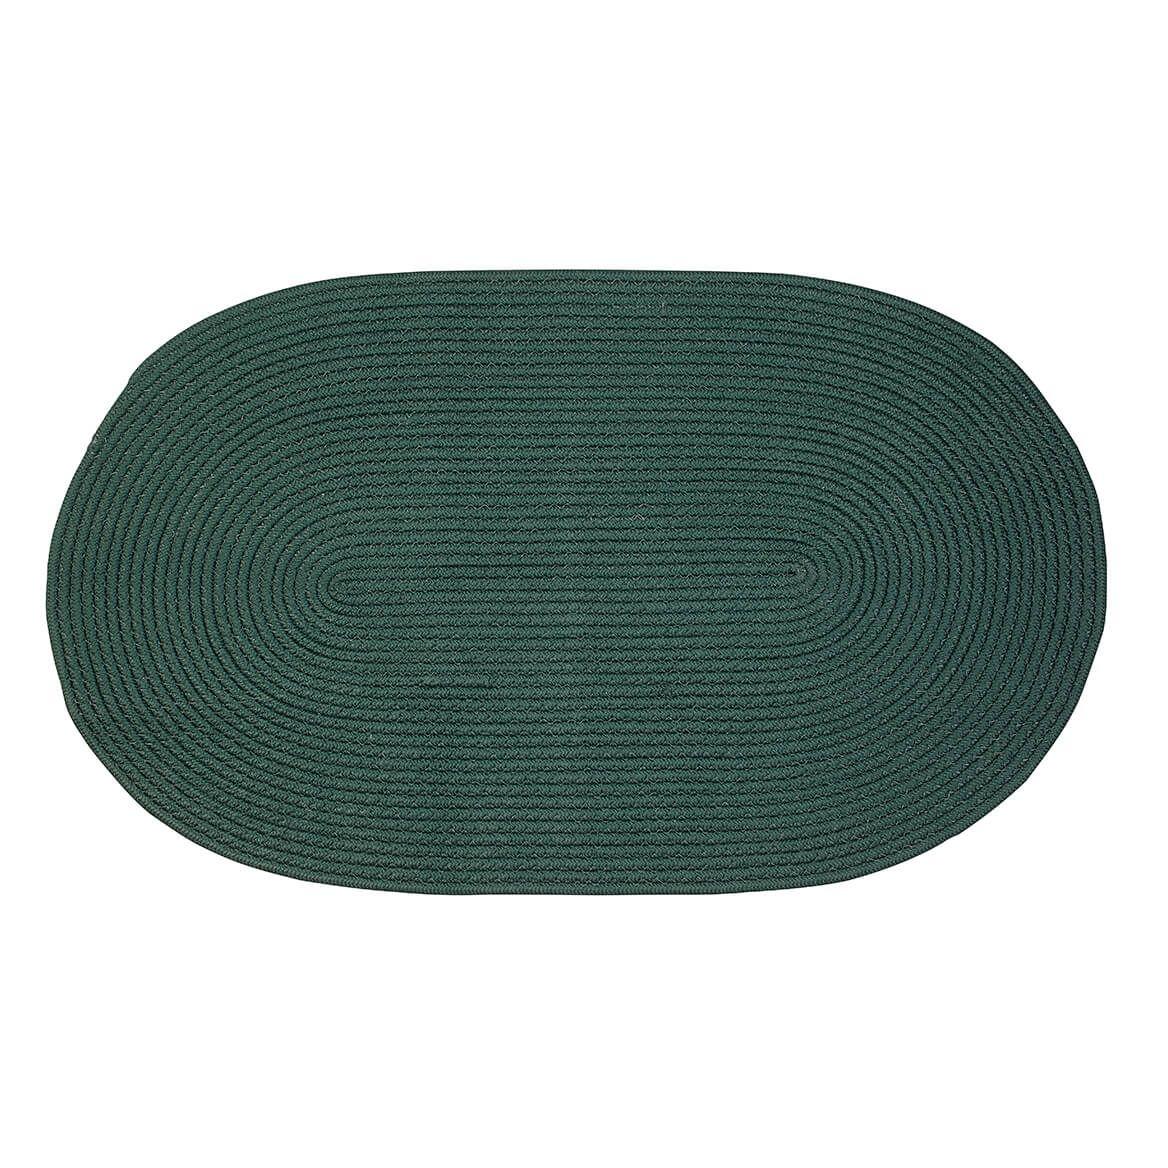 Solid Traditional Braided Rug by OakRidge       XL-363864